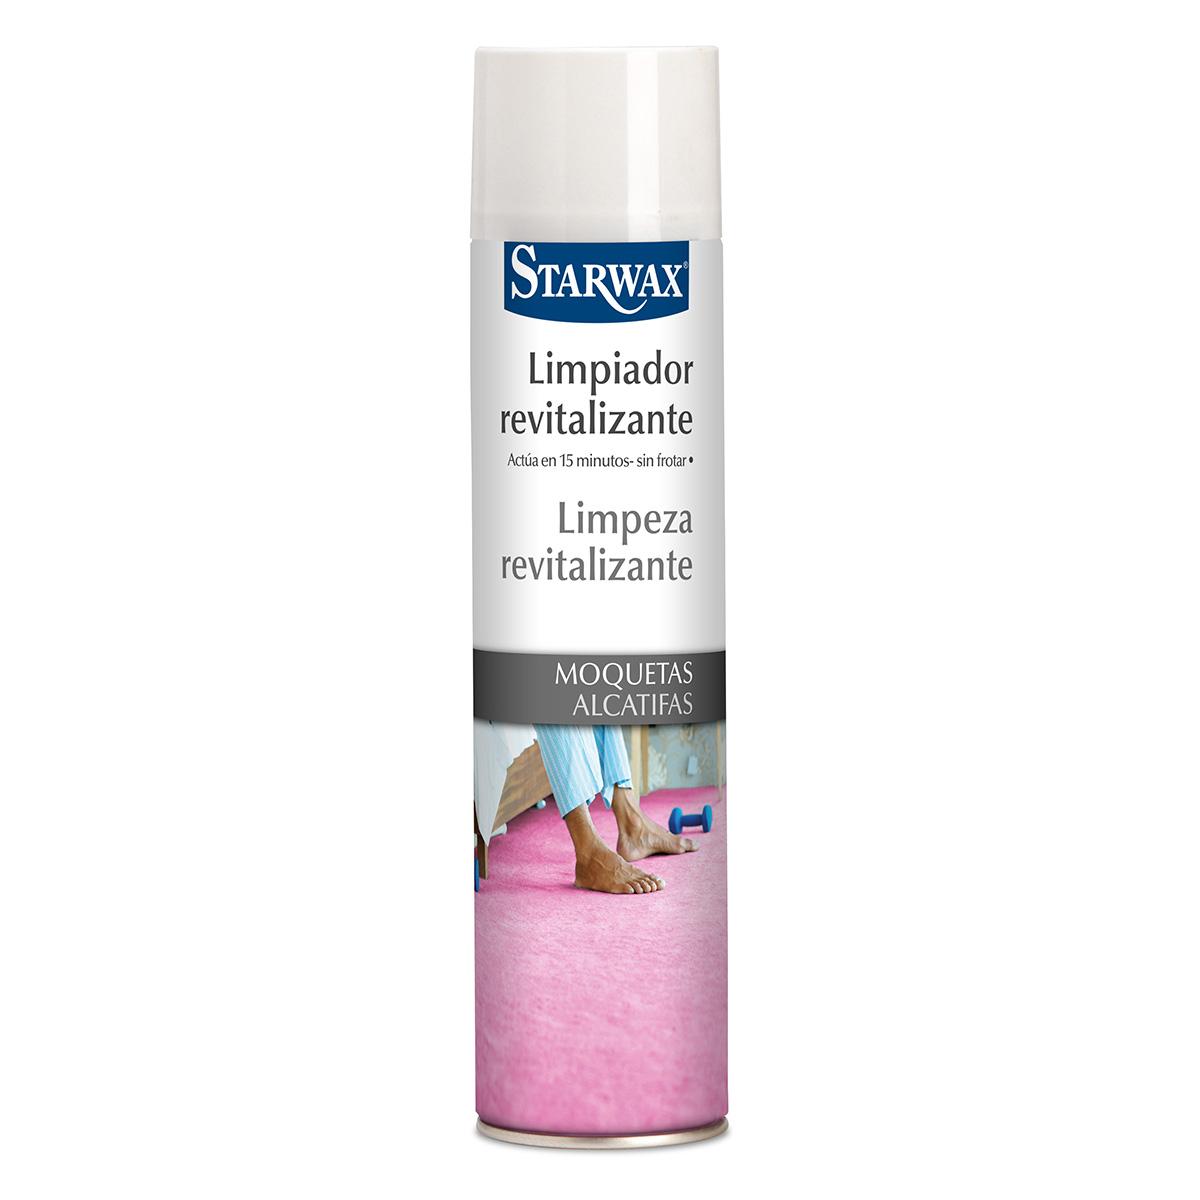 Limpiador revitalizante moquetas alfombras - Starwax